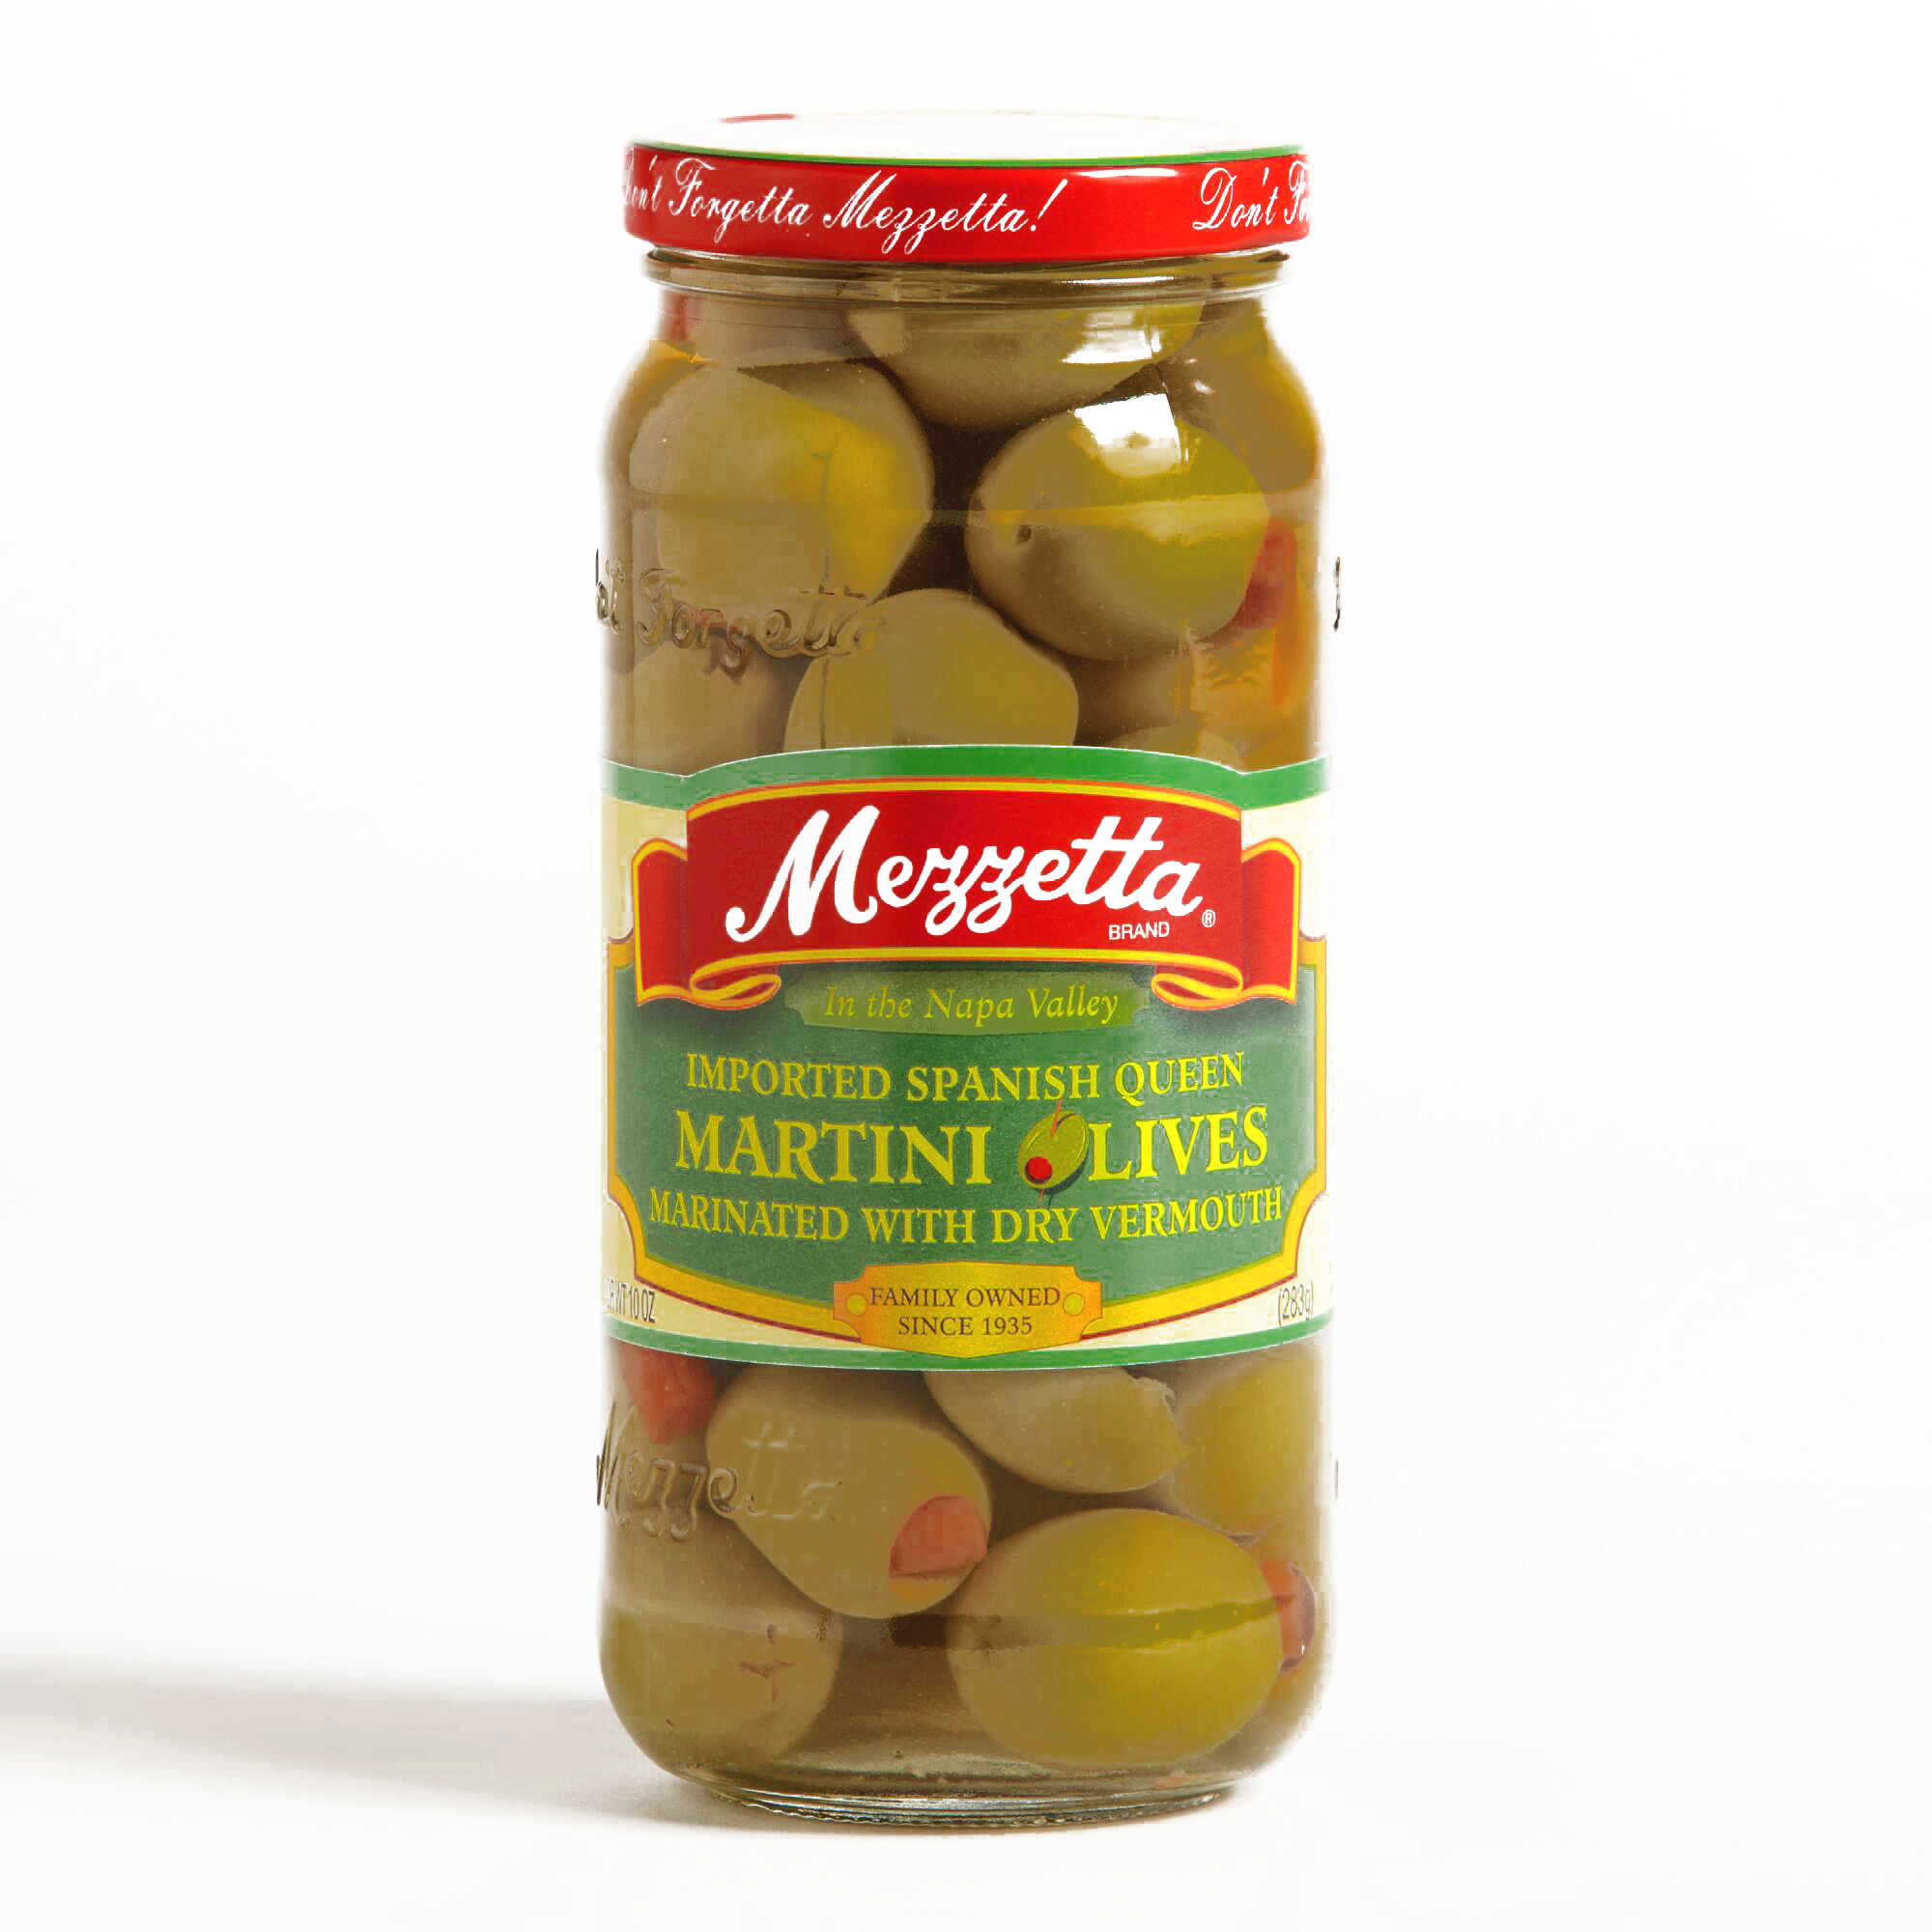 Mezzetta Martini Olives 10 oz each (1 Item Per Order, not per case) by